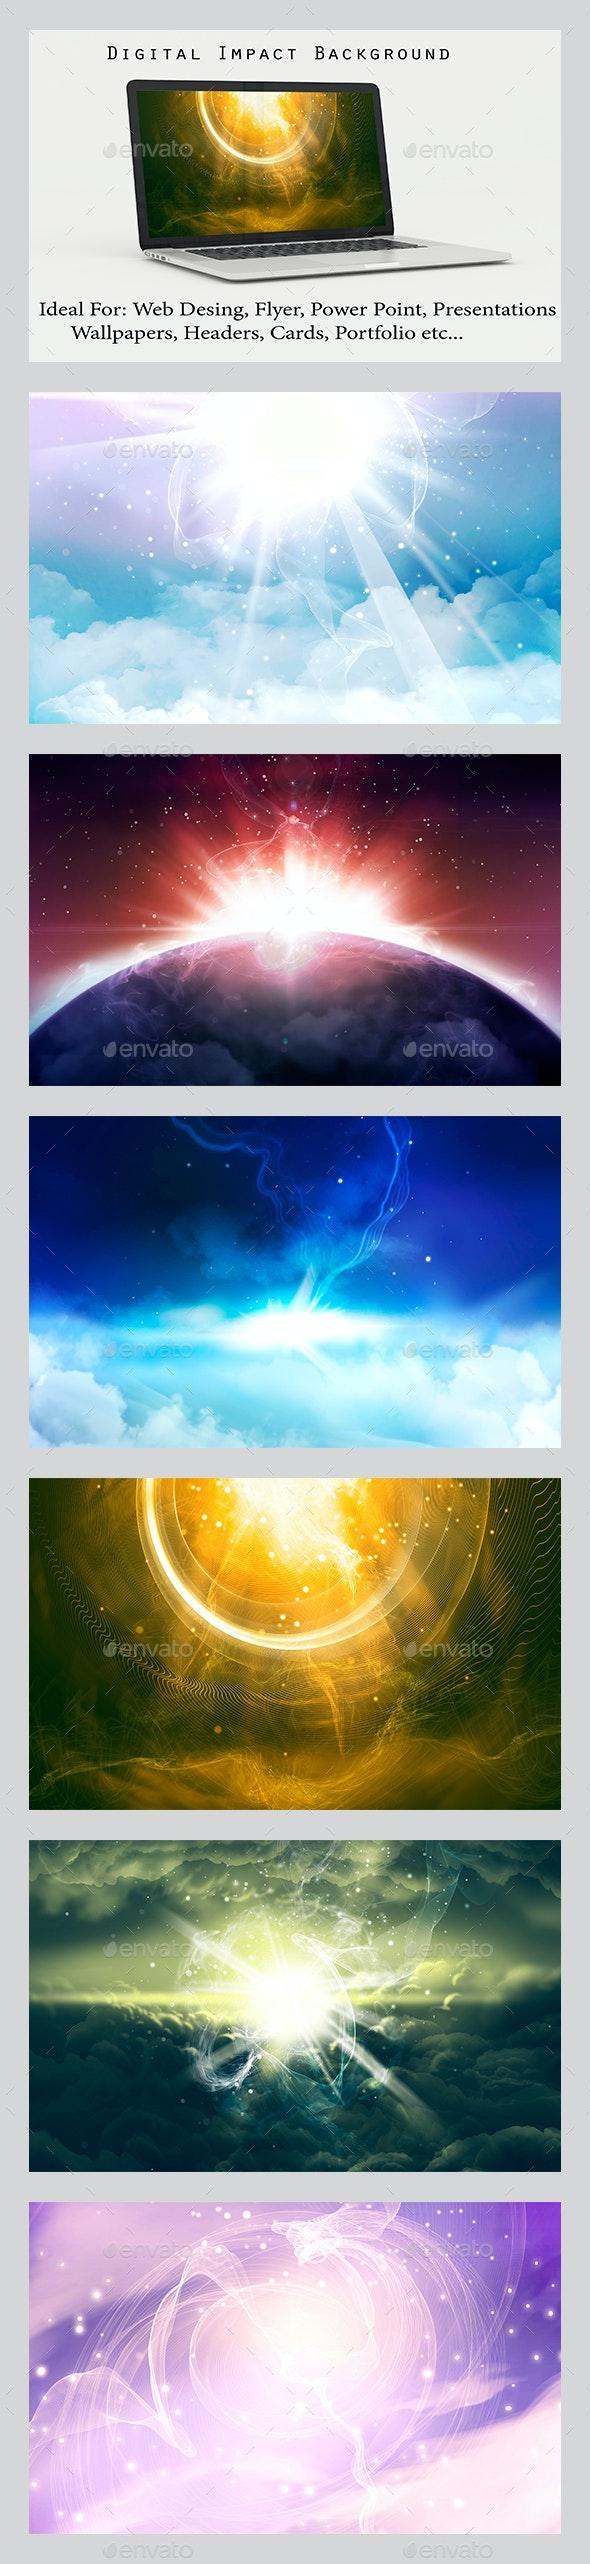 Digital Impact - Backgrounds Graphics